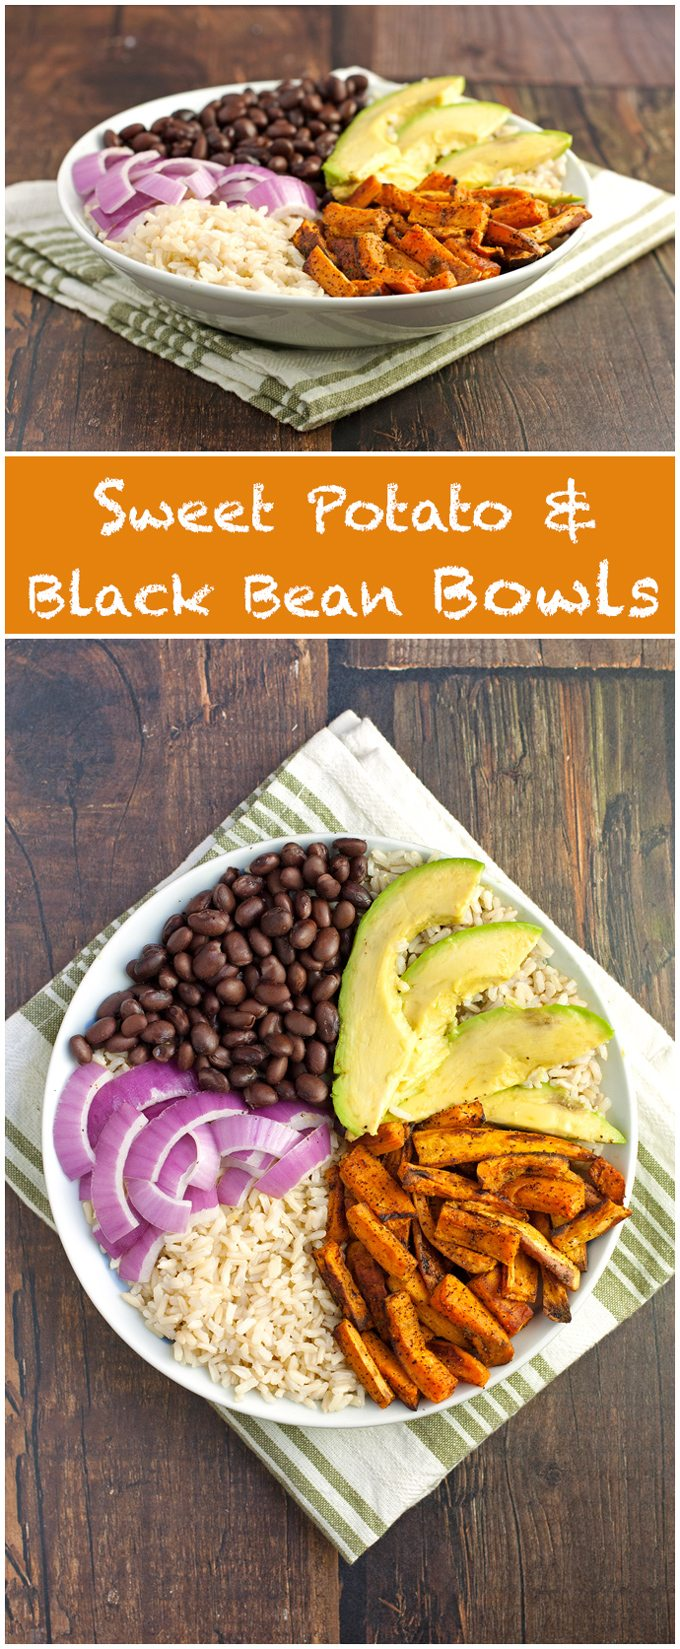 Sweet Potato and Black Bean Bowls - 2Teaspoons